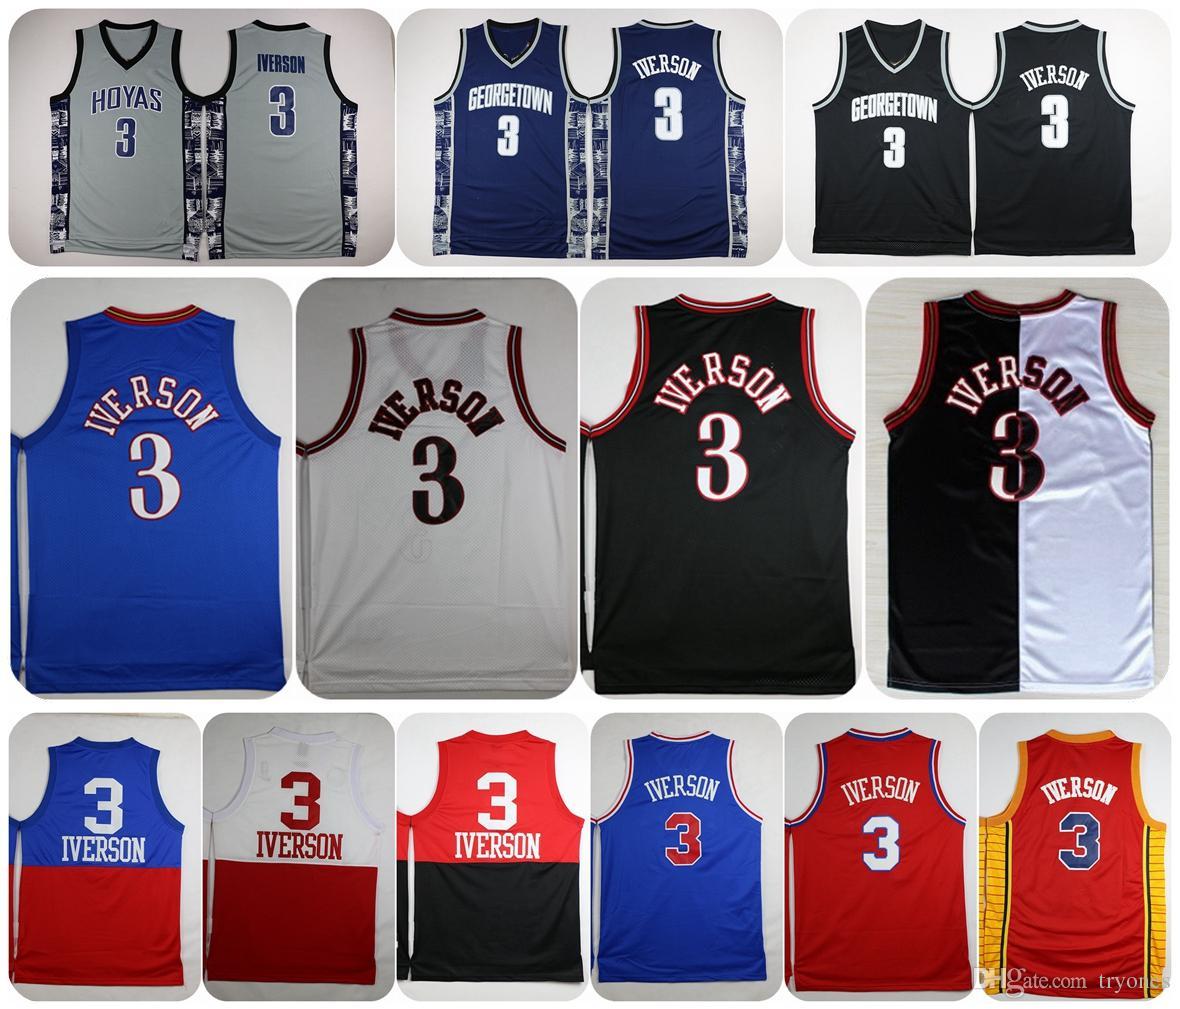 d1f44dd1825 ... 2017 Georgetown Hoyas Allen Iverson College Basketball Jersey  University 3 Allen Iverson Throwback Shirts Cheap Retro ...